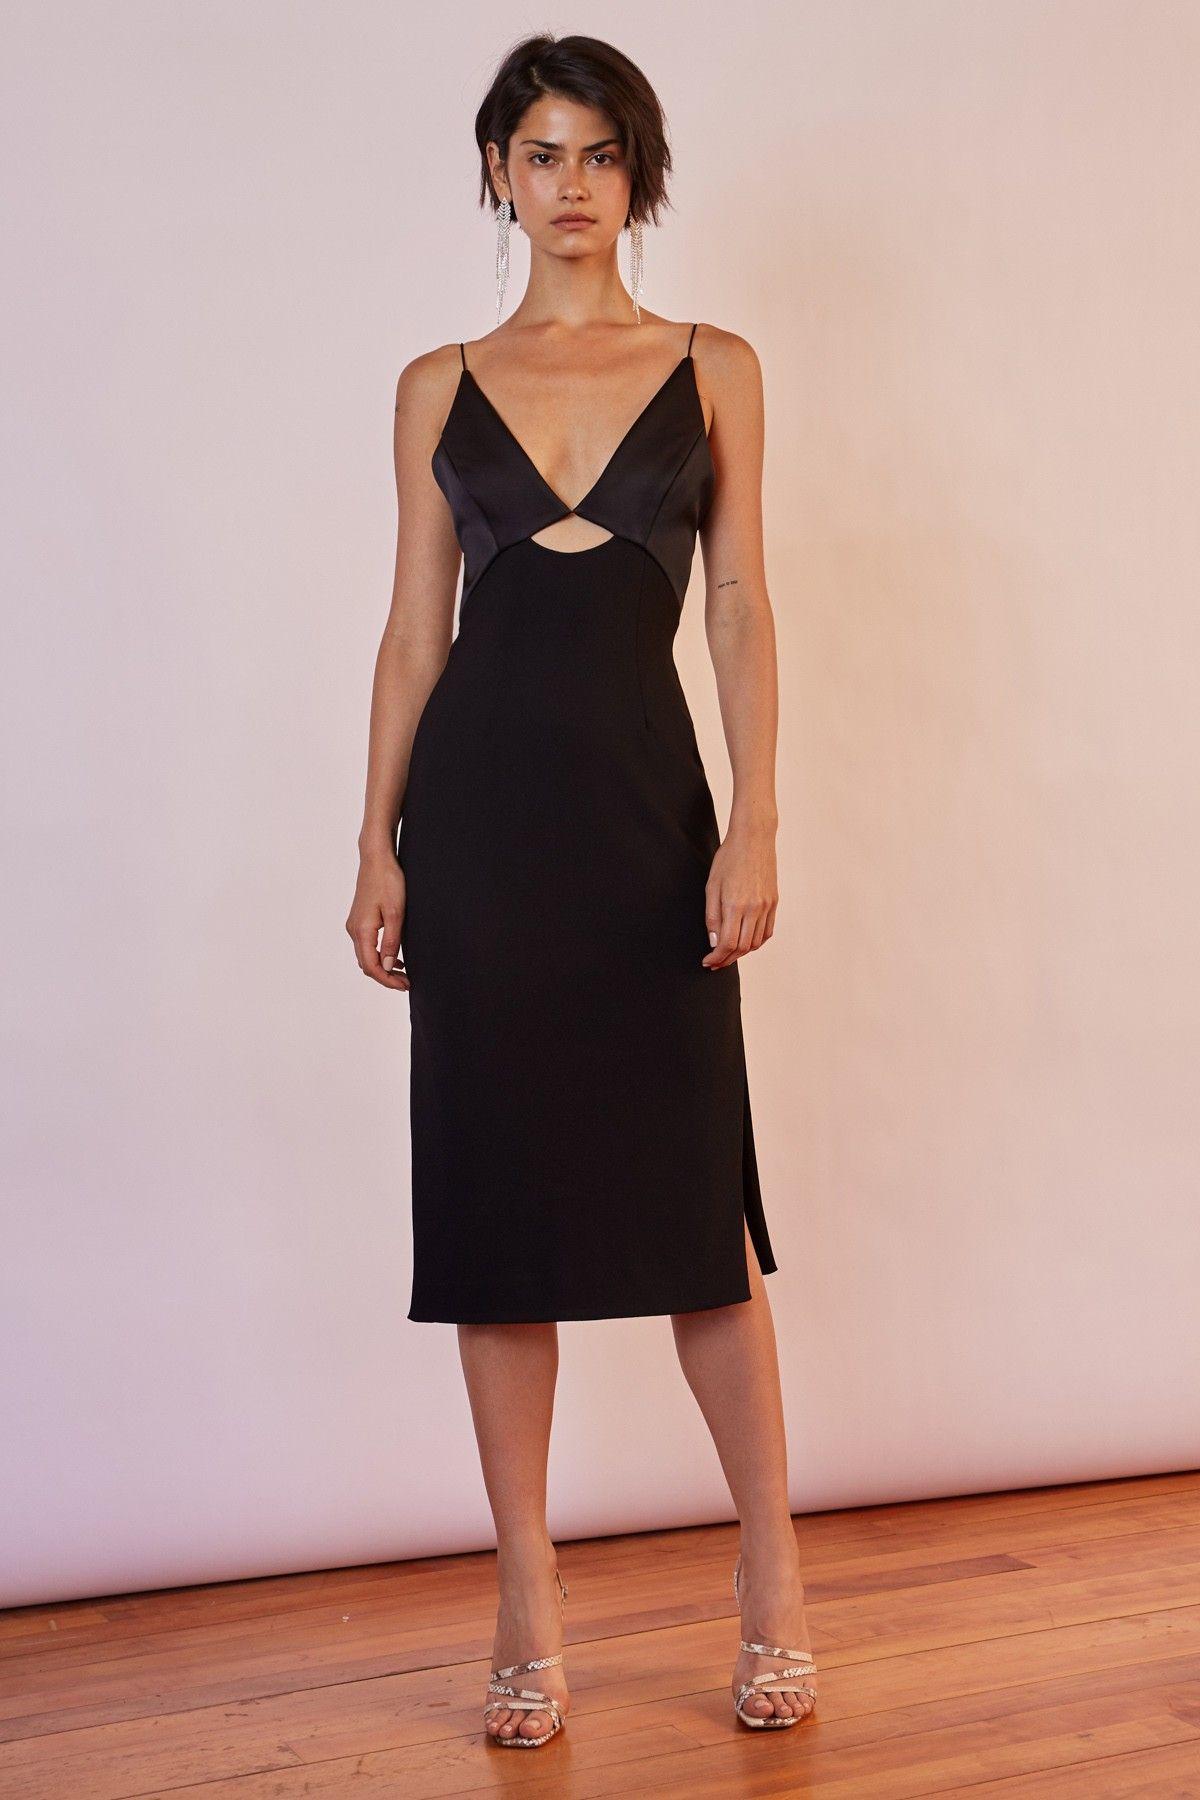 Dresses   Women's Dresses Online   Find your new fave at BNKR